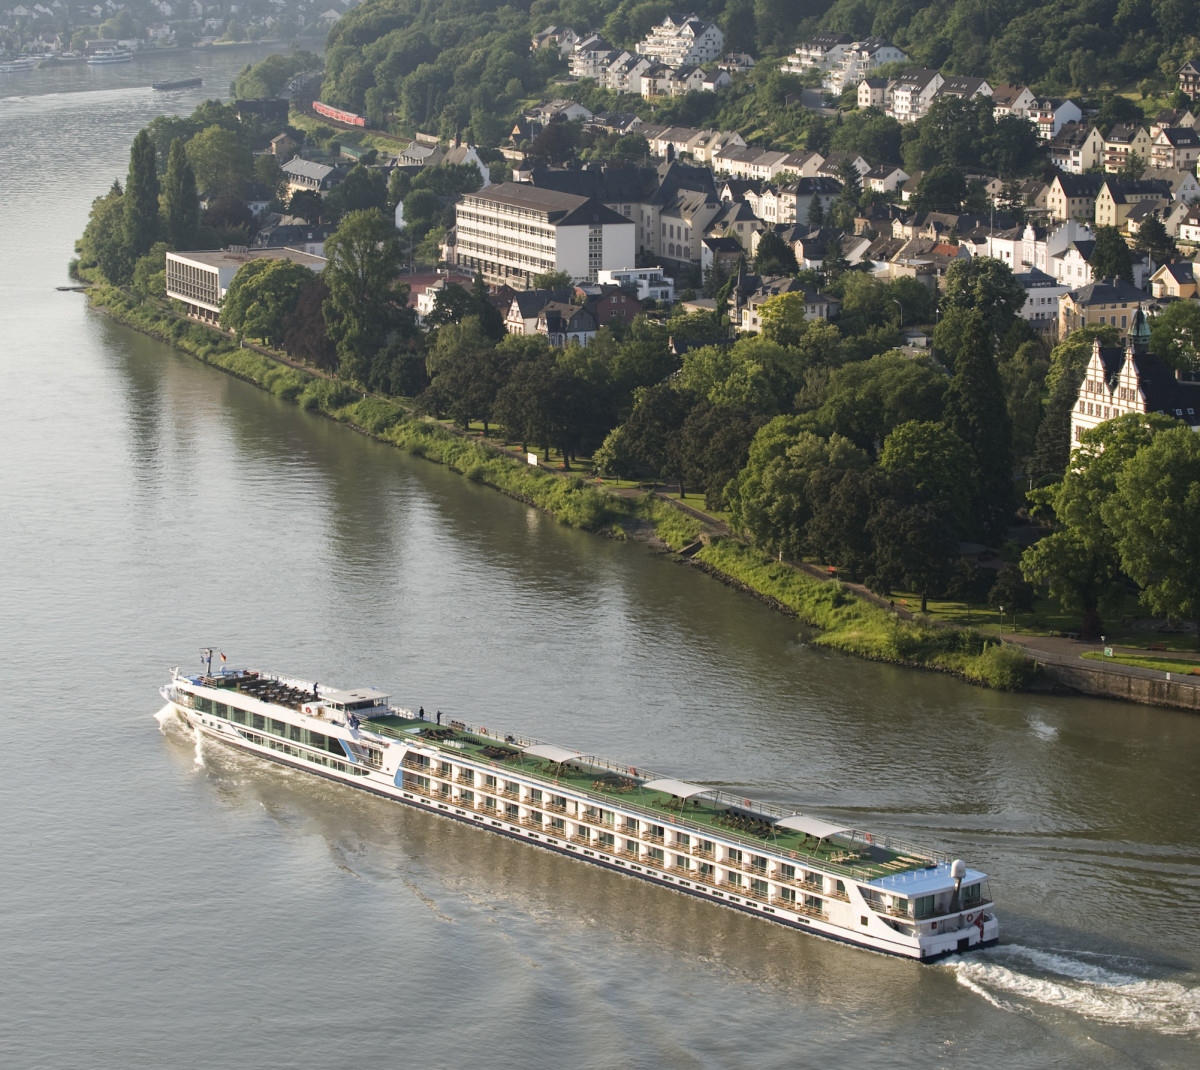 Cruising along the Rhine, Germany